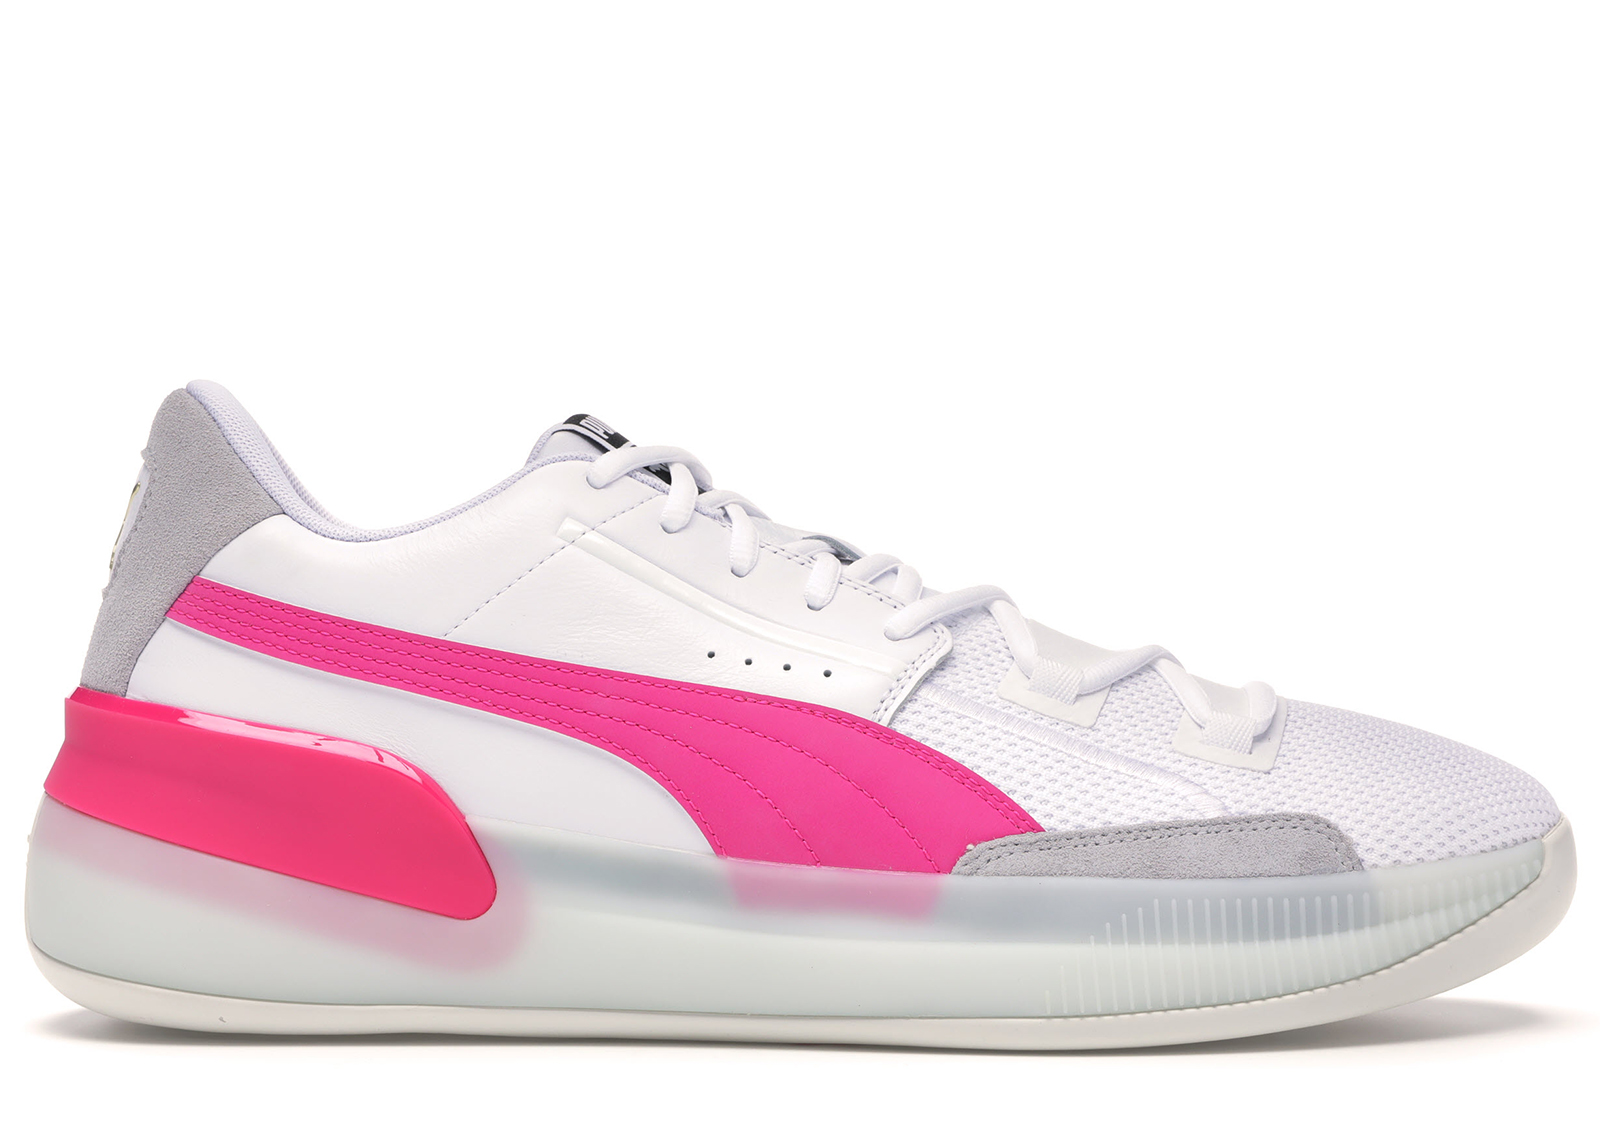 Puma Clyde Hardwood White Pink